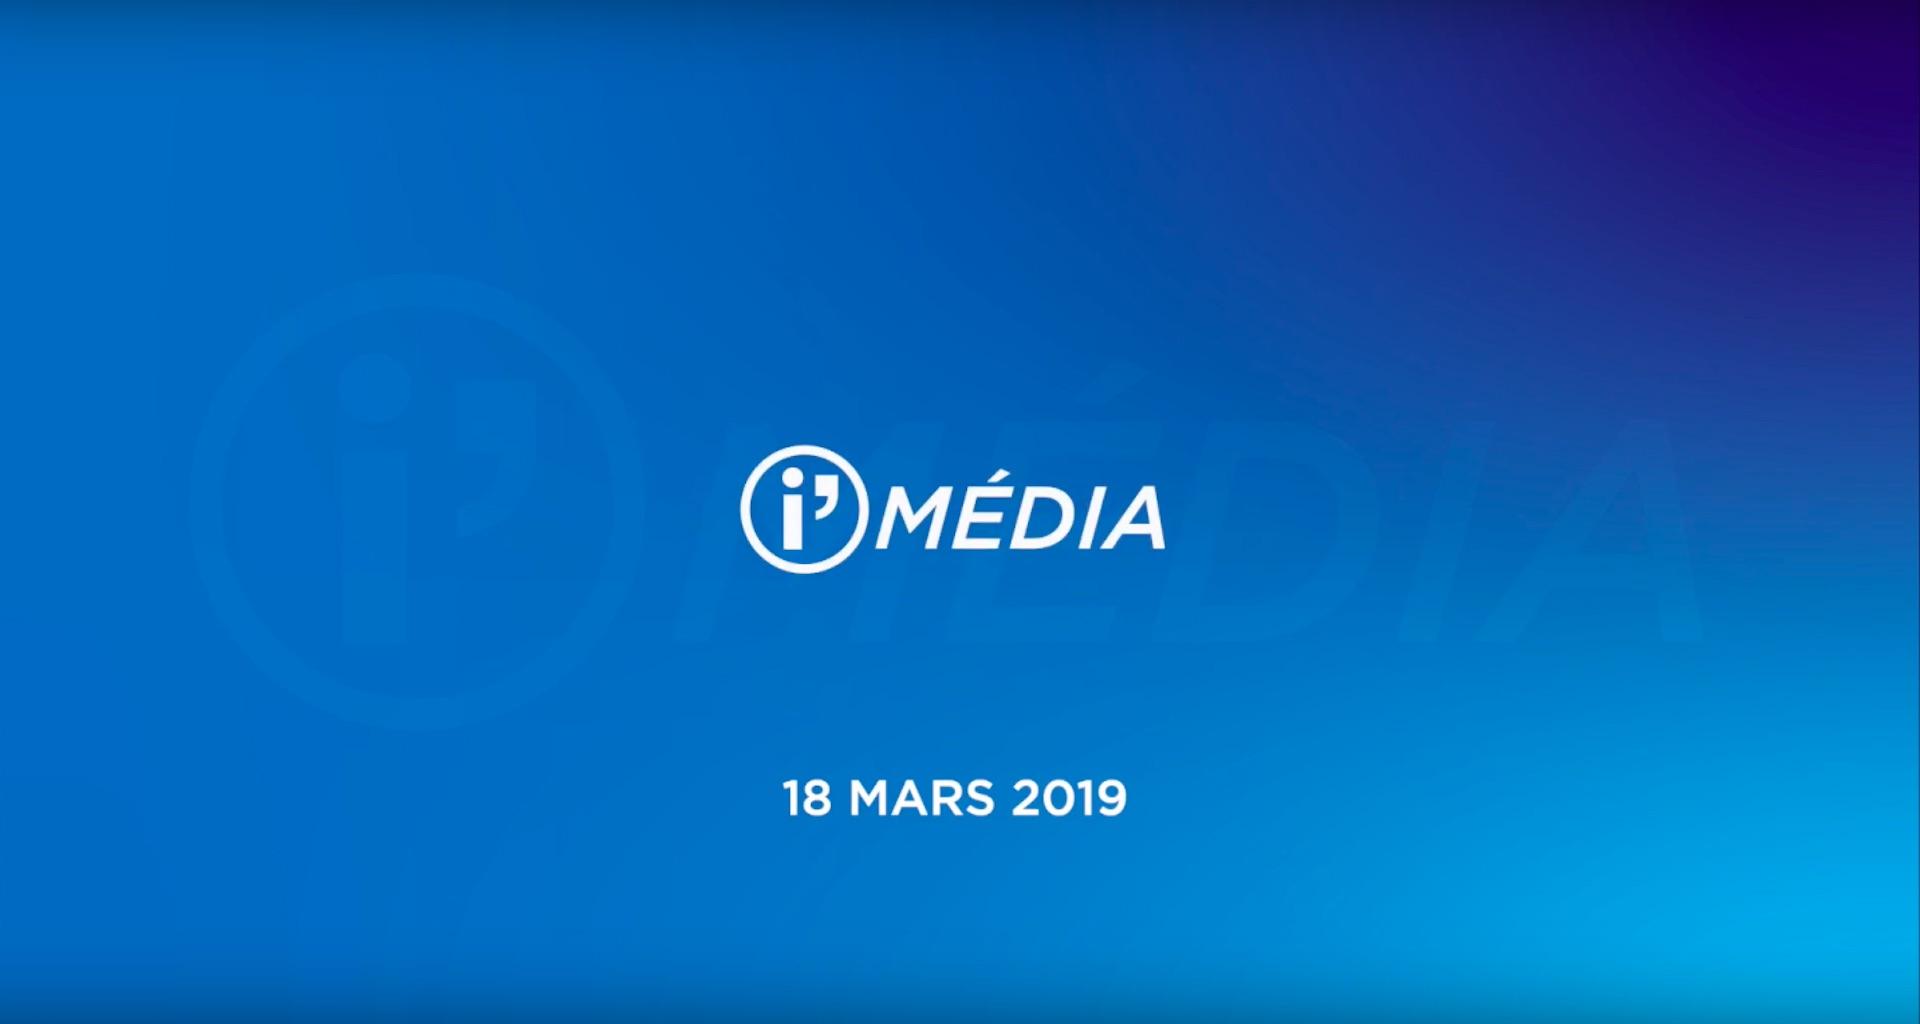 I'média 18.03.2019